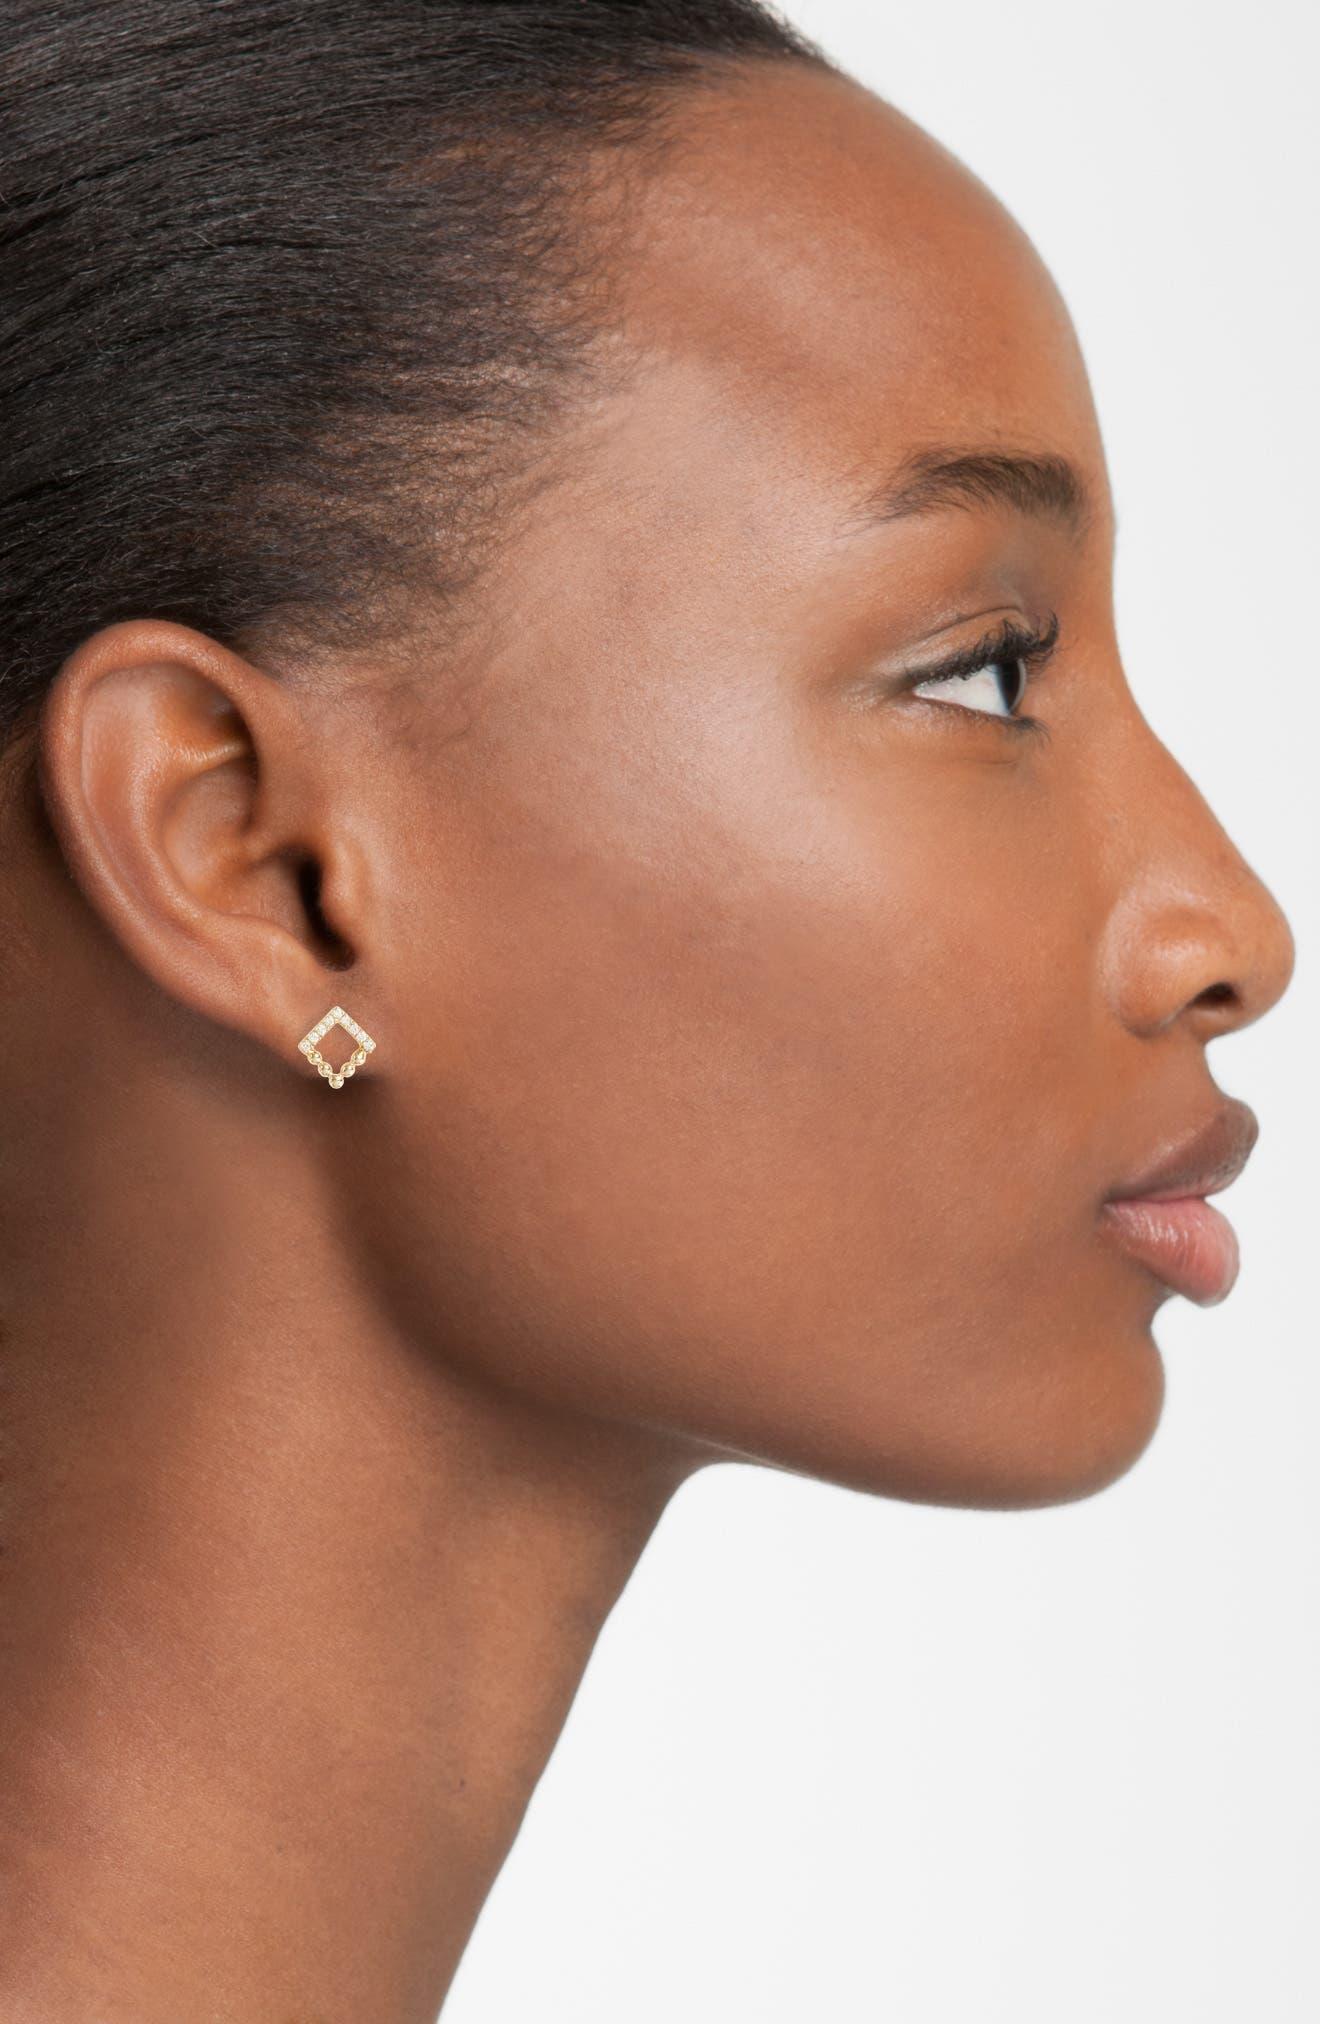 Poppy Rae Square Diamond Stud Earrings,                             Alternate thumbnail 2, color,                             710